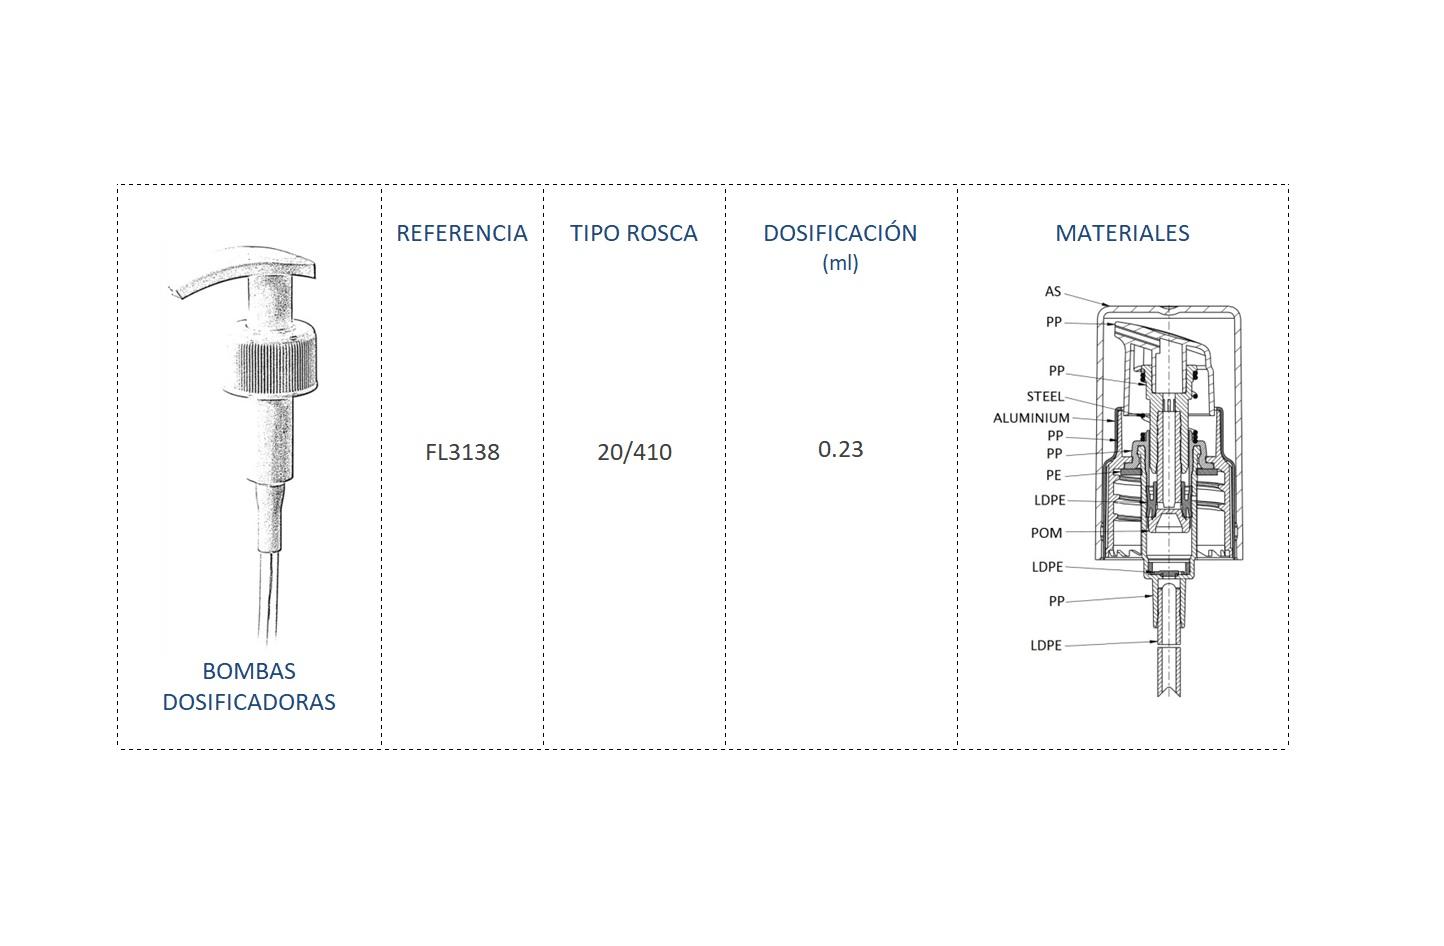 Cuadro de materiales bomba dosificadora FL3138 20/410